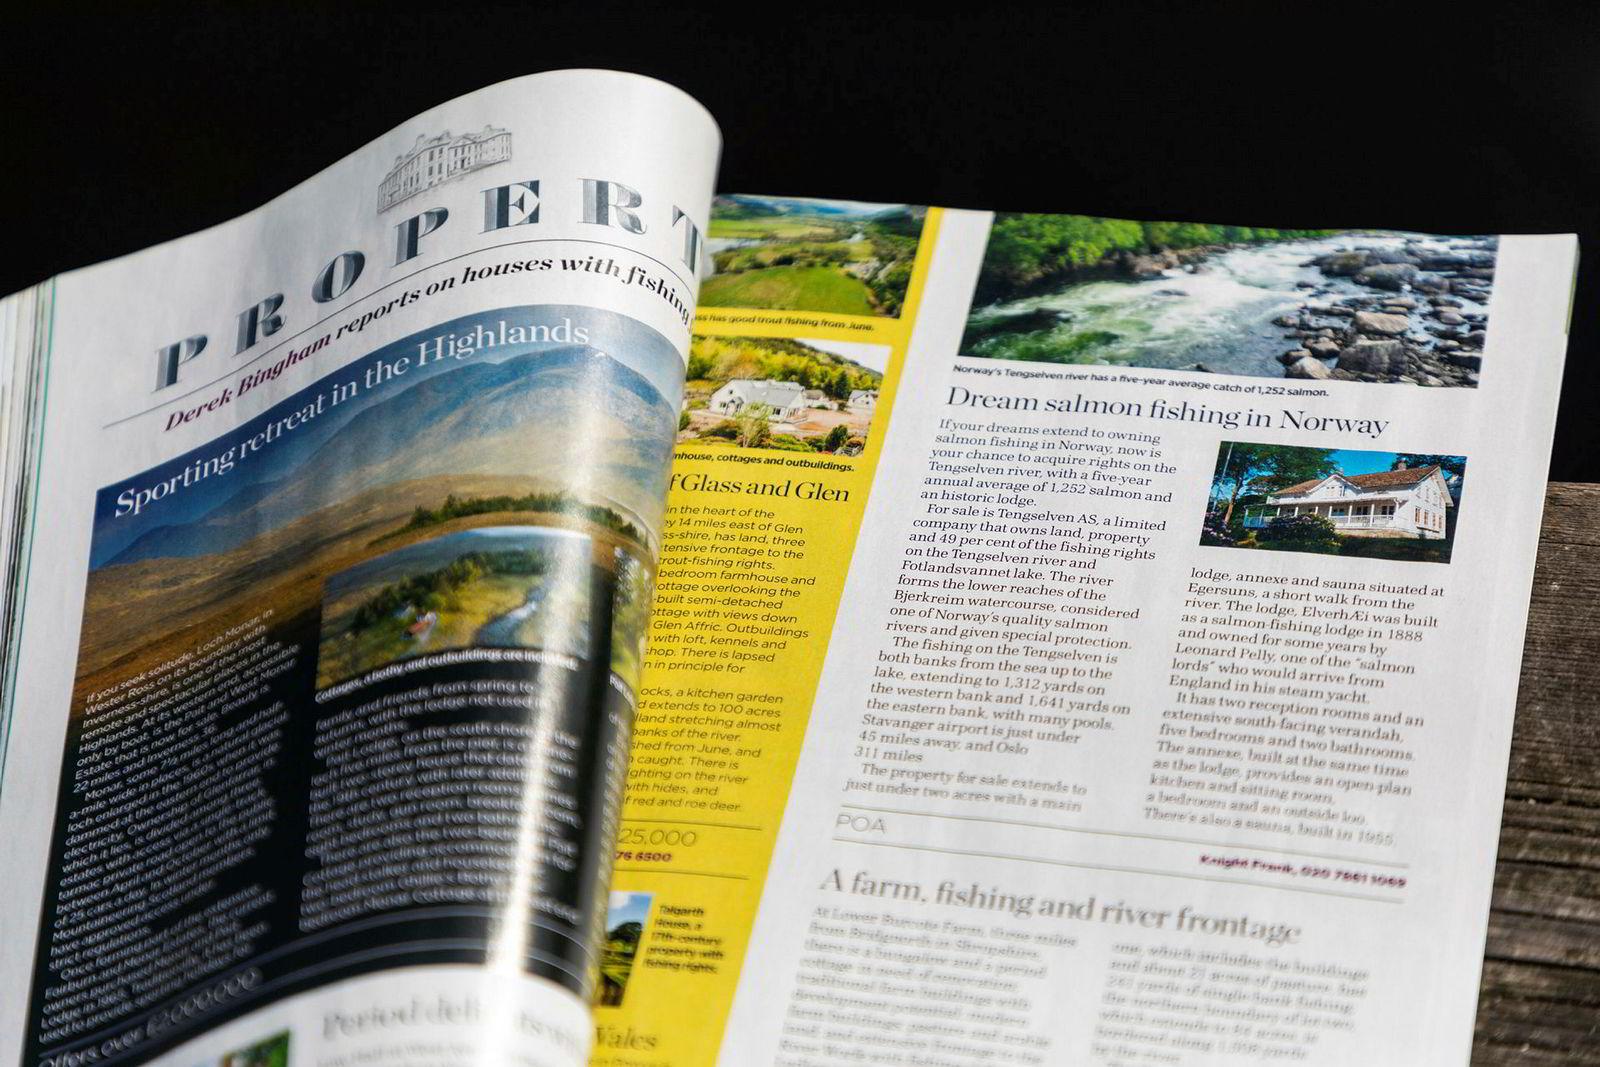 Olsens laksebolig er annonsert i det britiske magasinet Trout & Salmon.